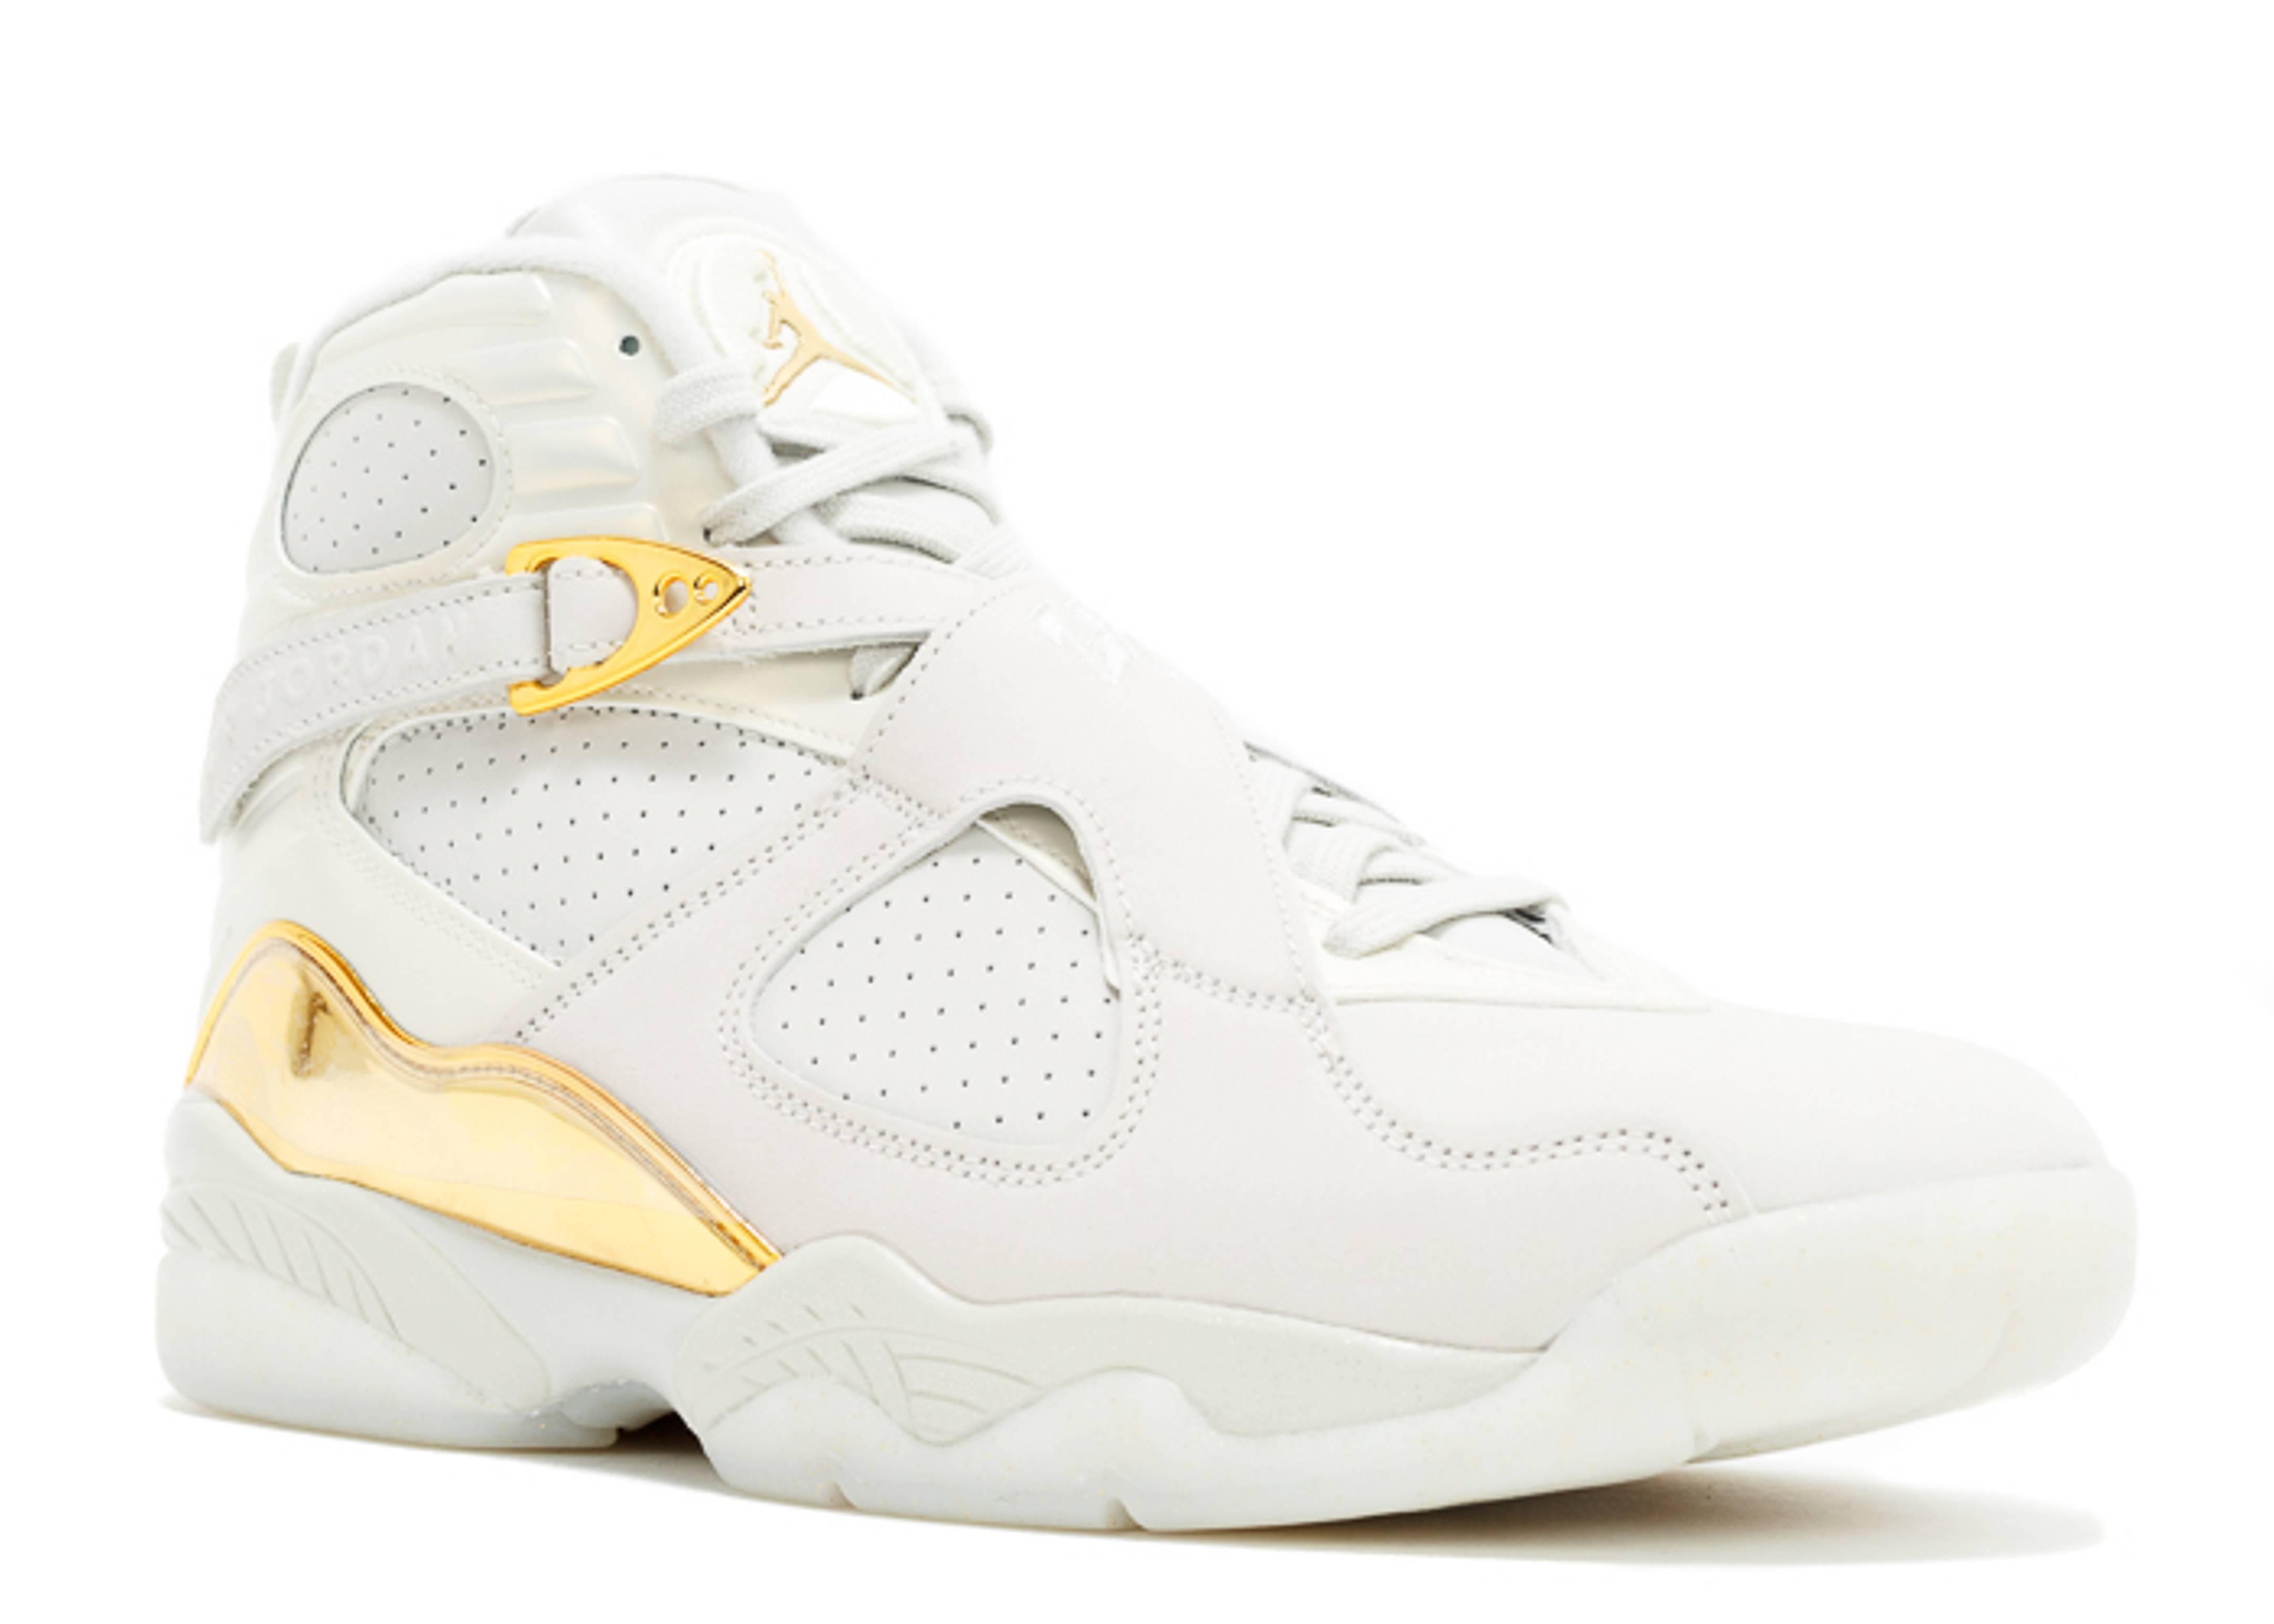 b8fc10581220 ... shop clearance air jordan 8 retro cc champagne light bone metallic gold white  832821 030 1b74d